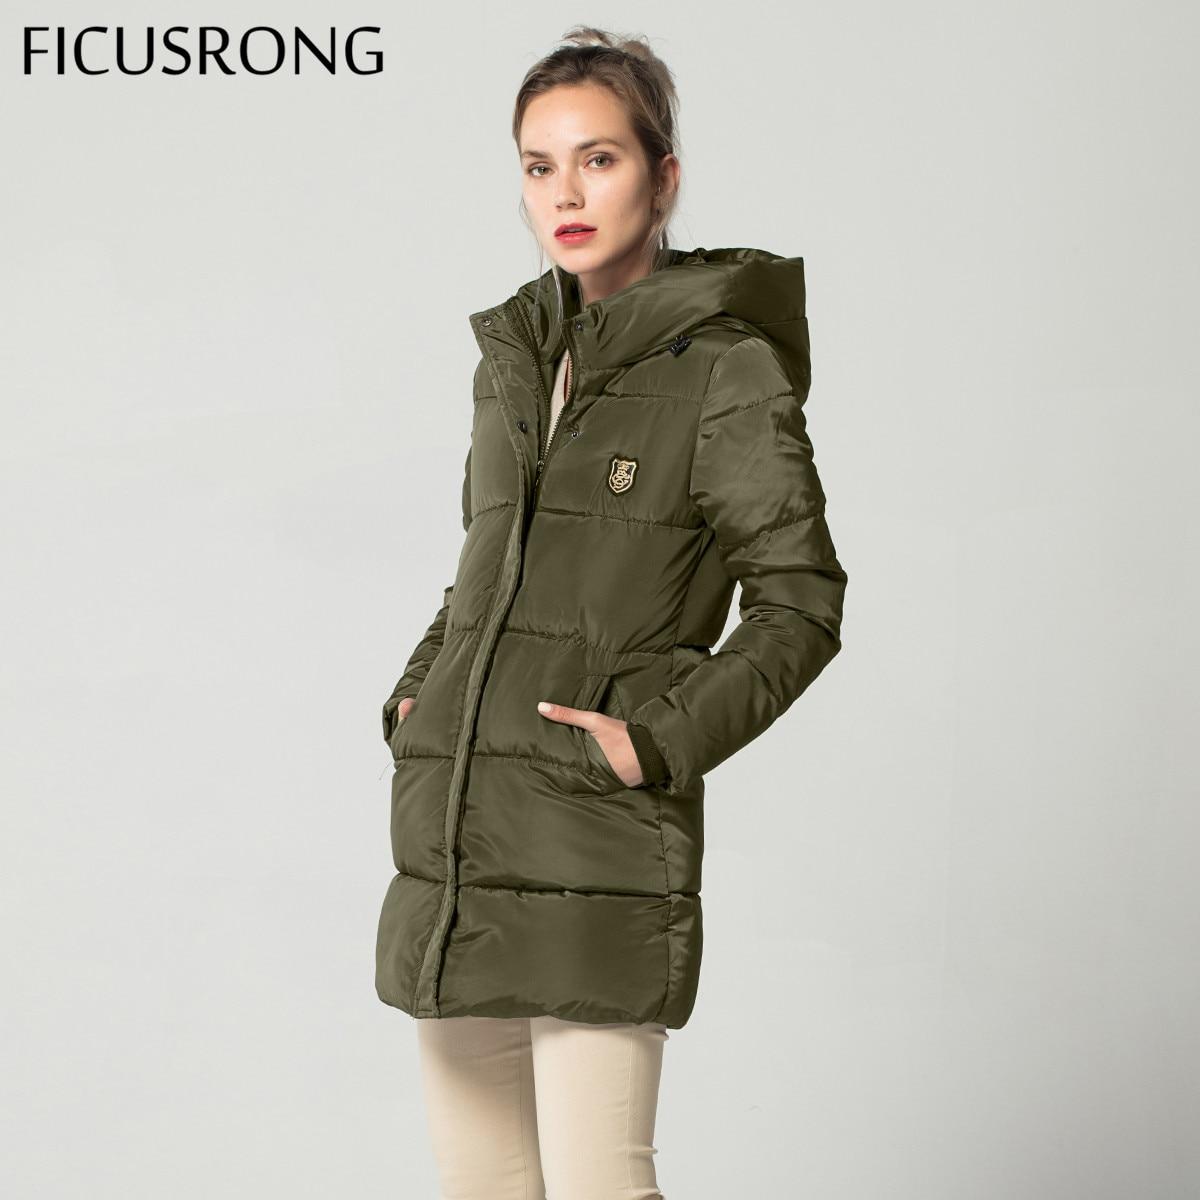 New Long   Basic     Jacket   Female Women Winter Hooded Coat Thick Cotton   Jacket   Womens Outerwear Tops casaco feminino FICUSRONG 2018